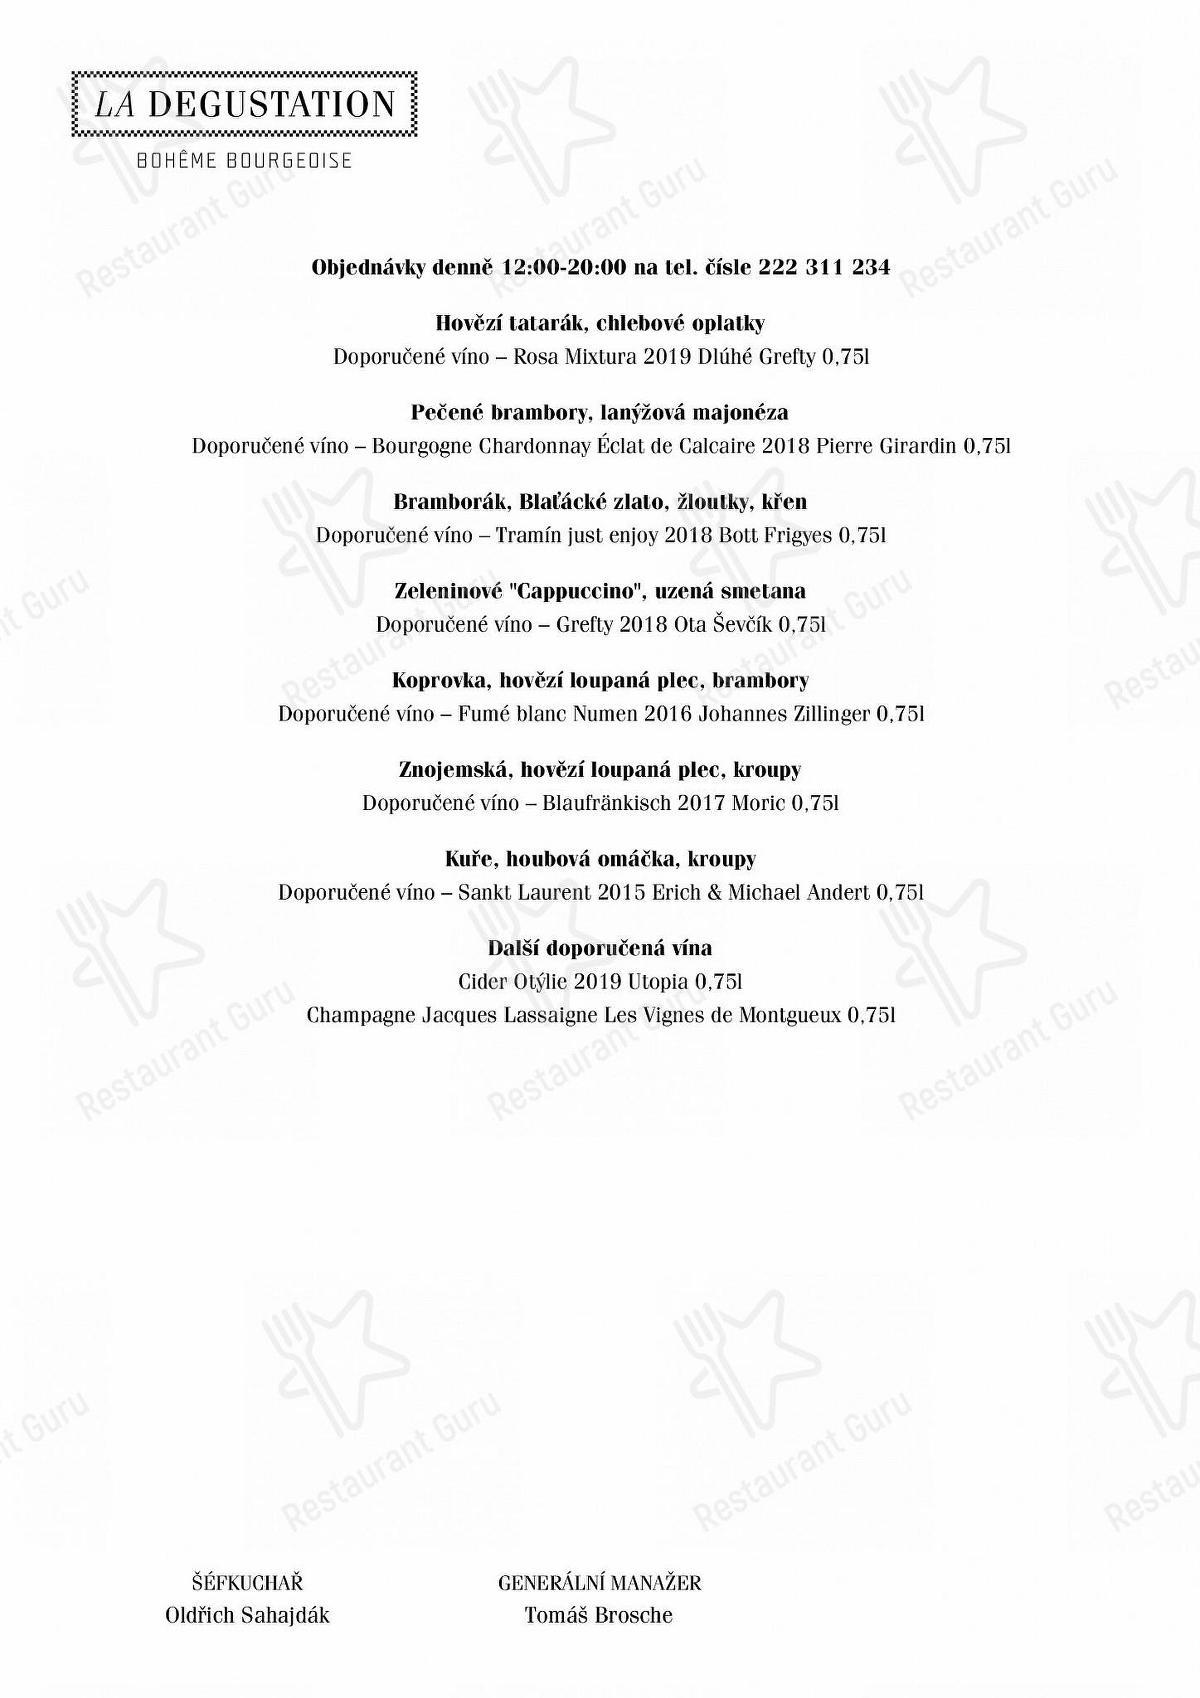 La Degustation Bohême Bourgeoise menu - dishes and beverages